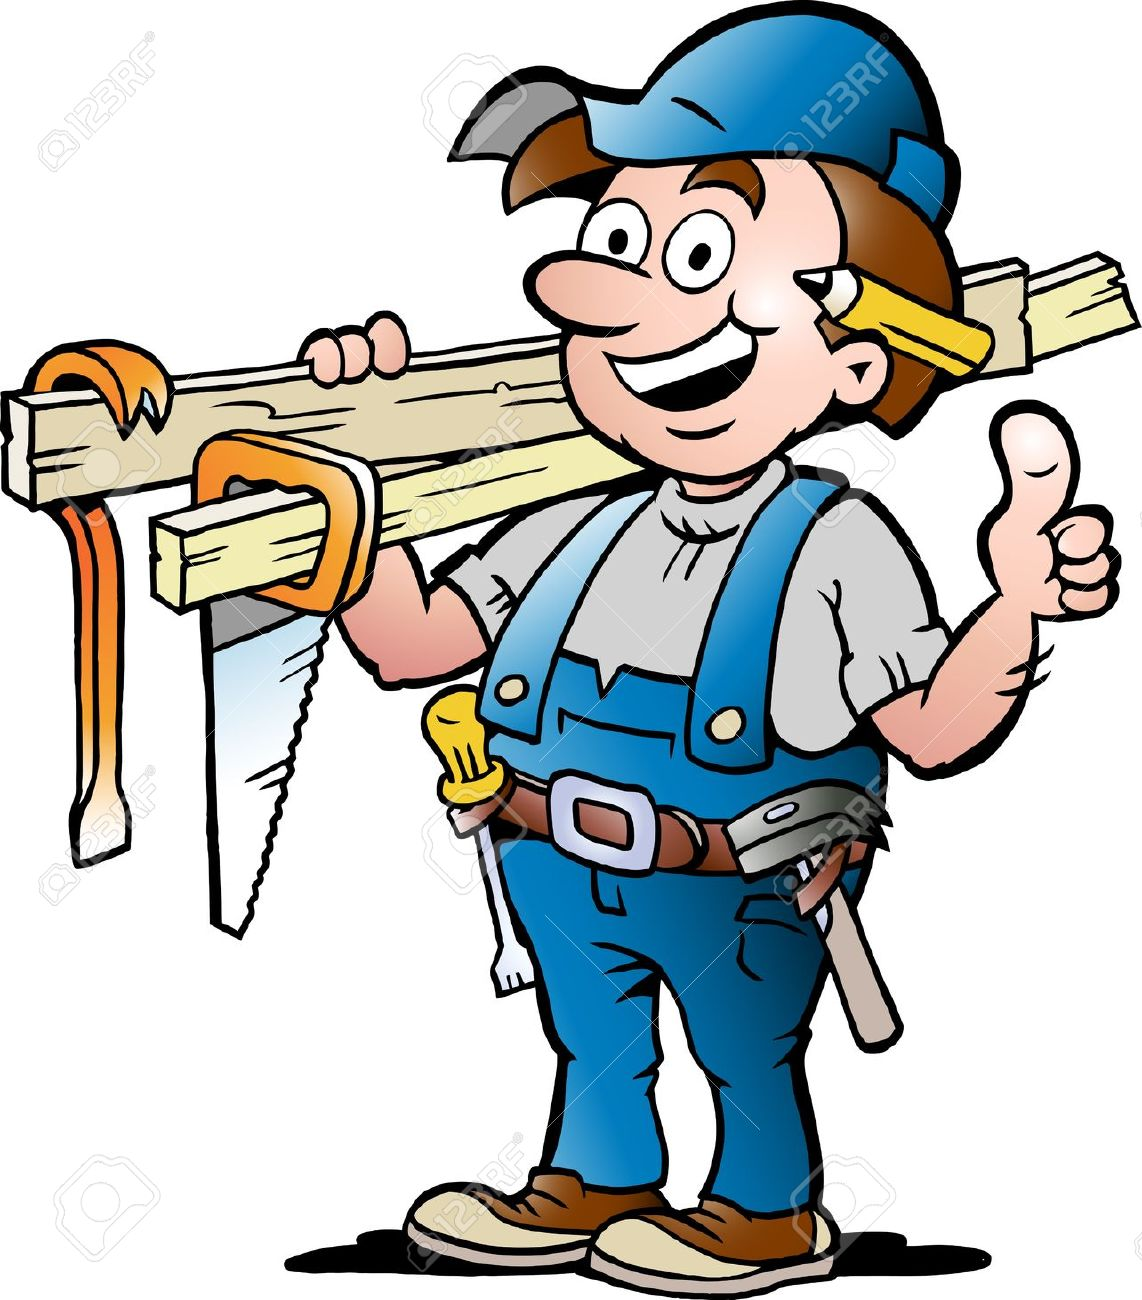 Carpenter clipart professional 10 » Clipart Station.